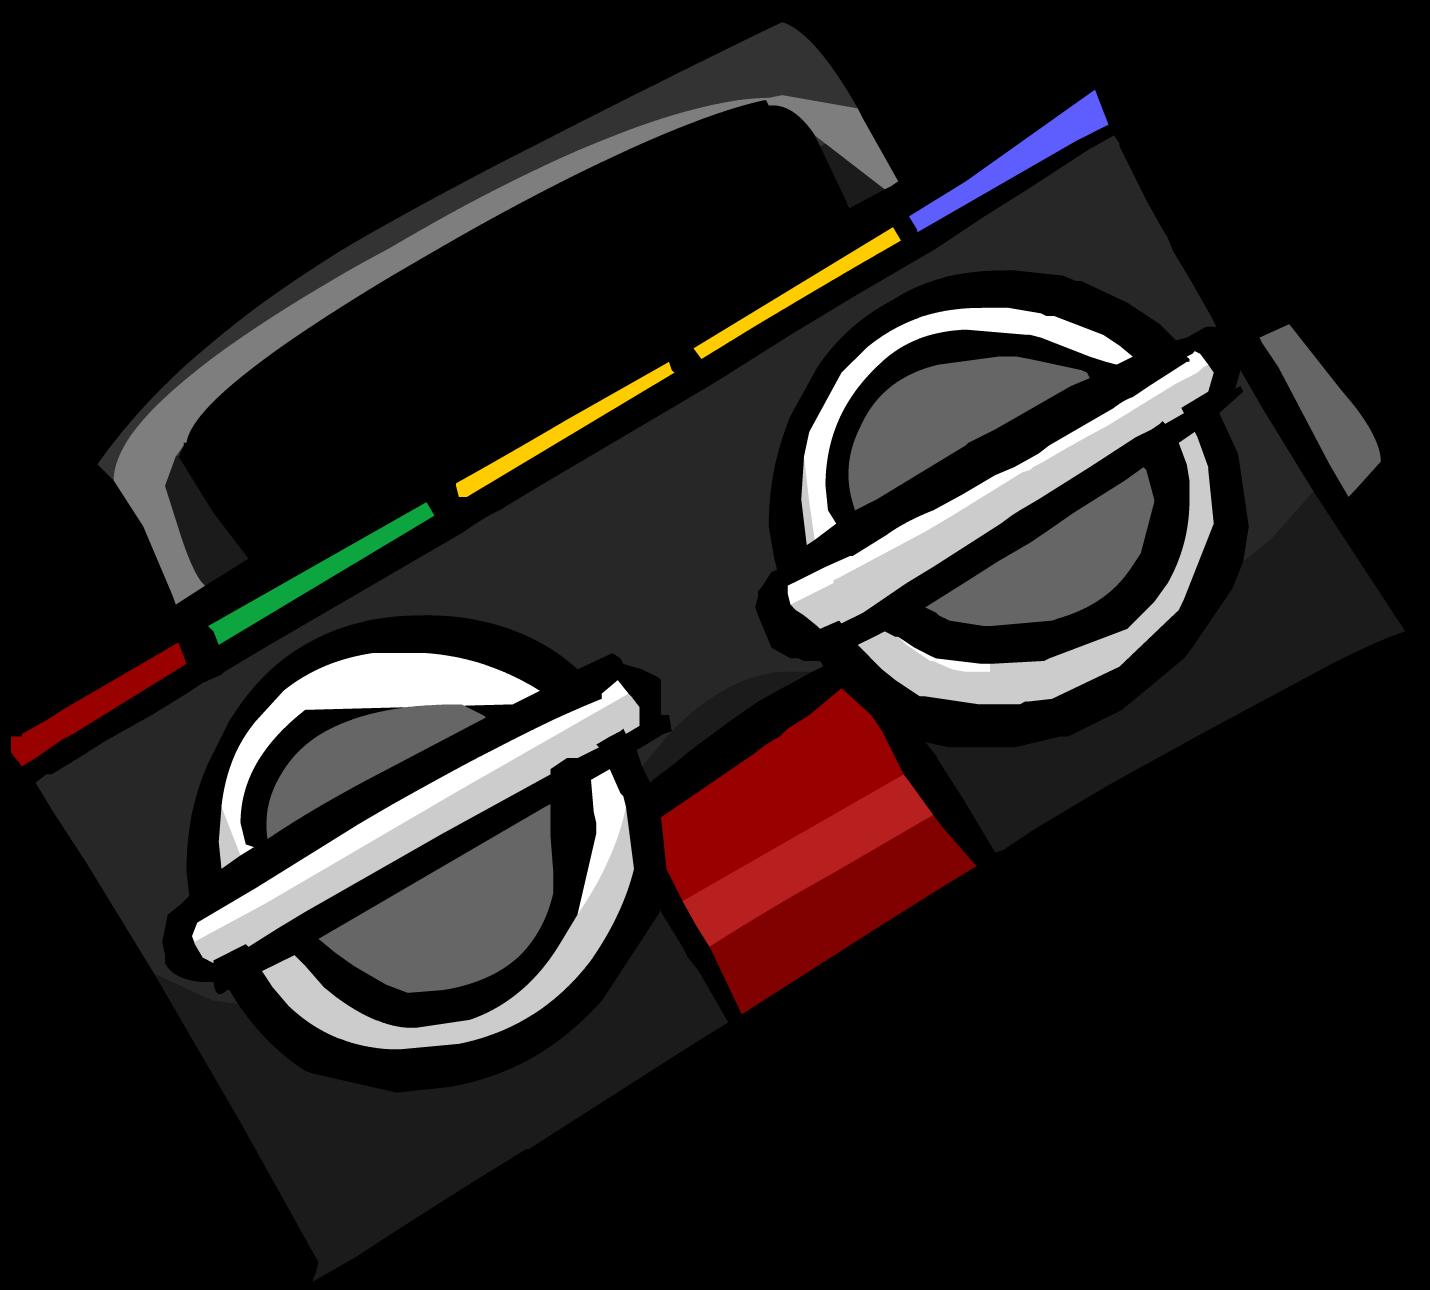 clip art Boombox